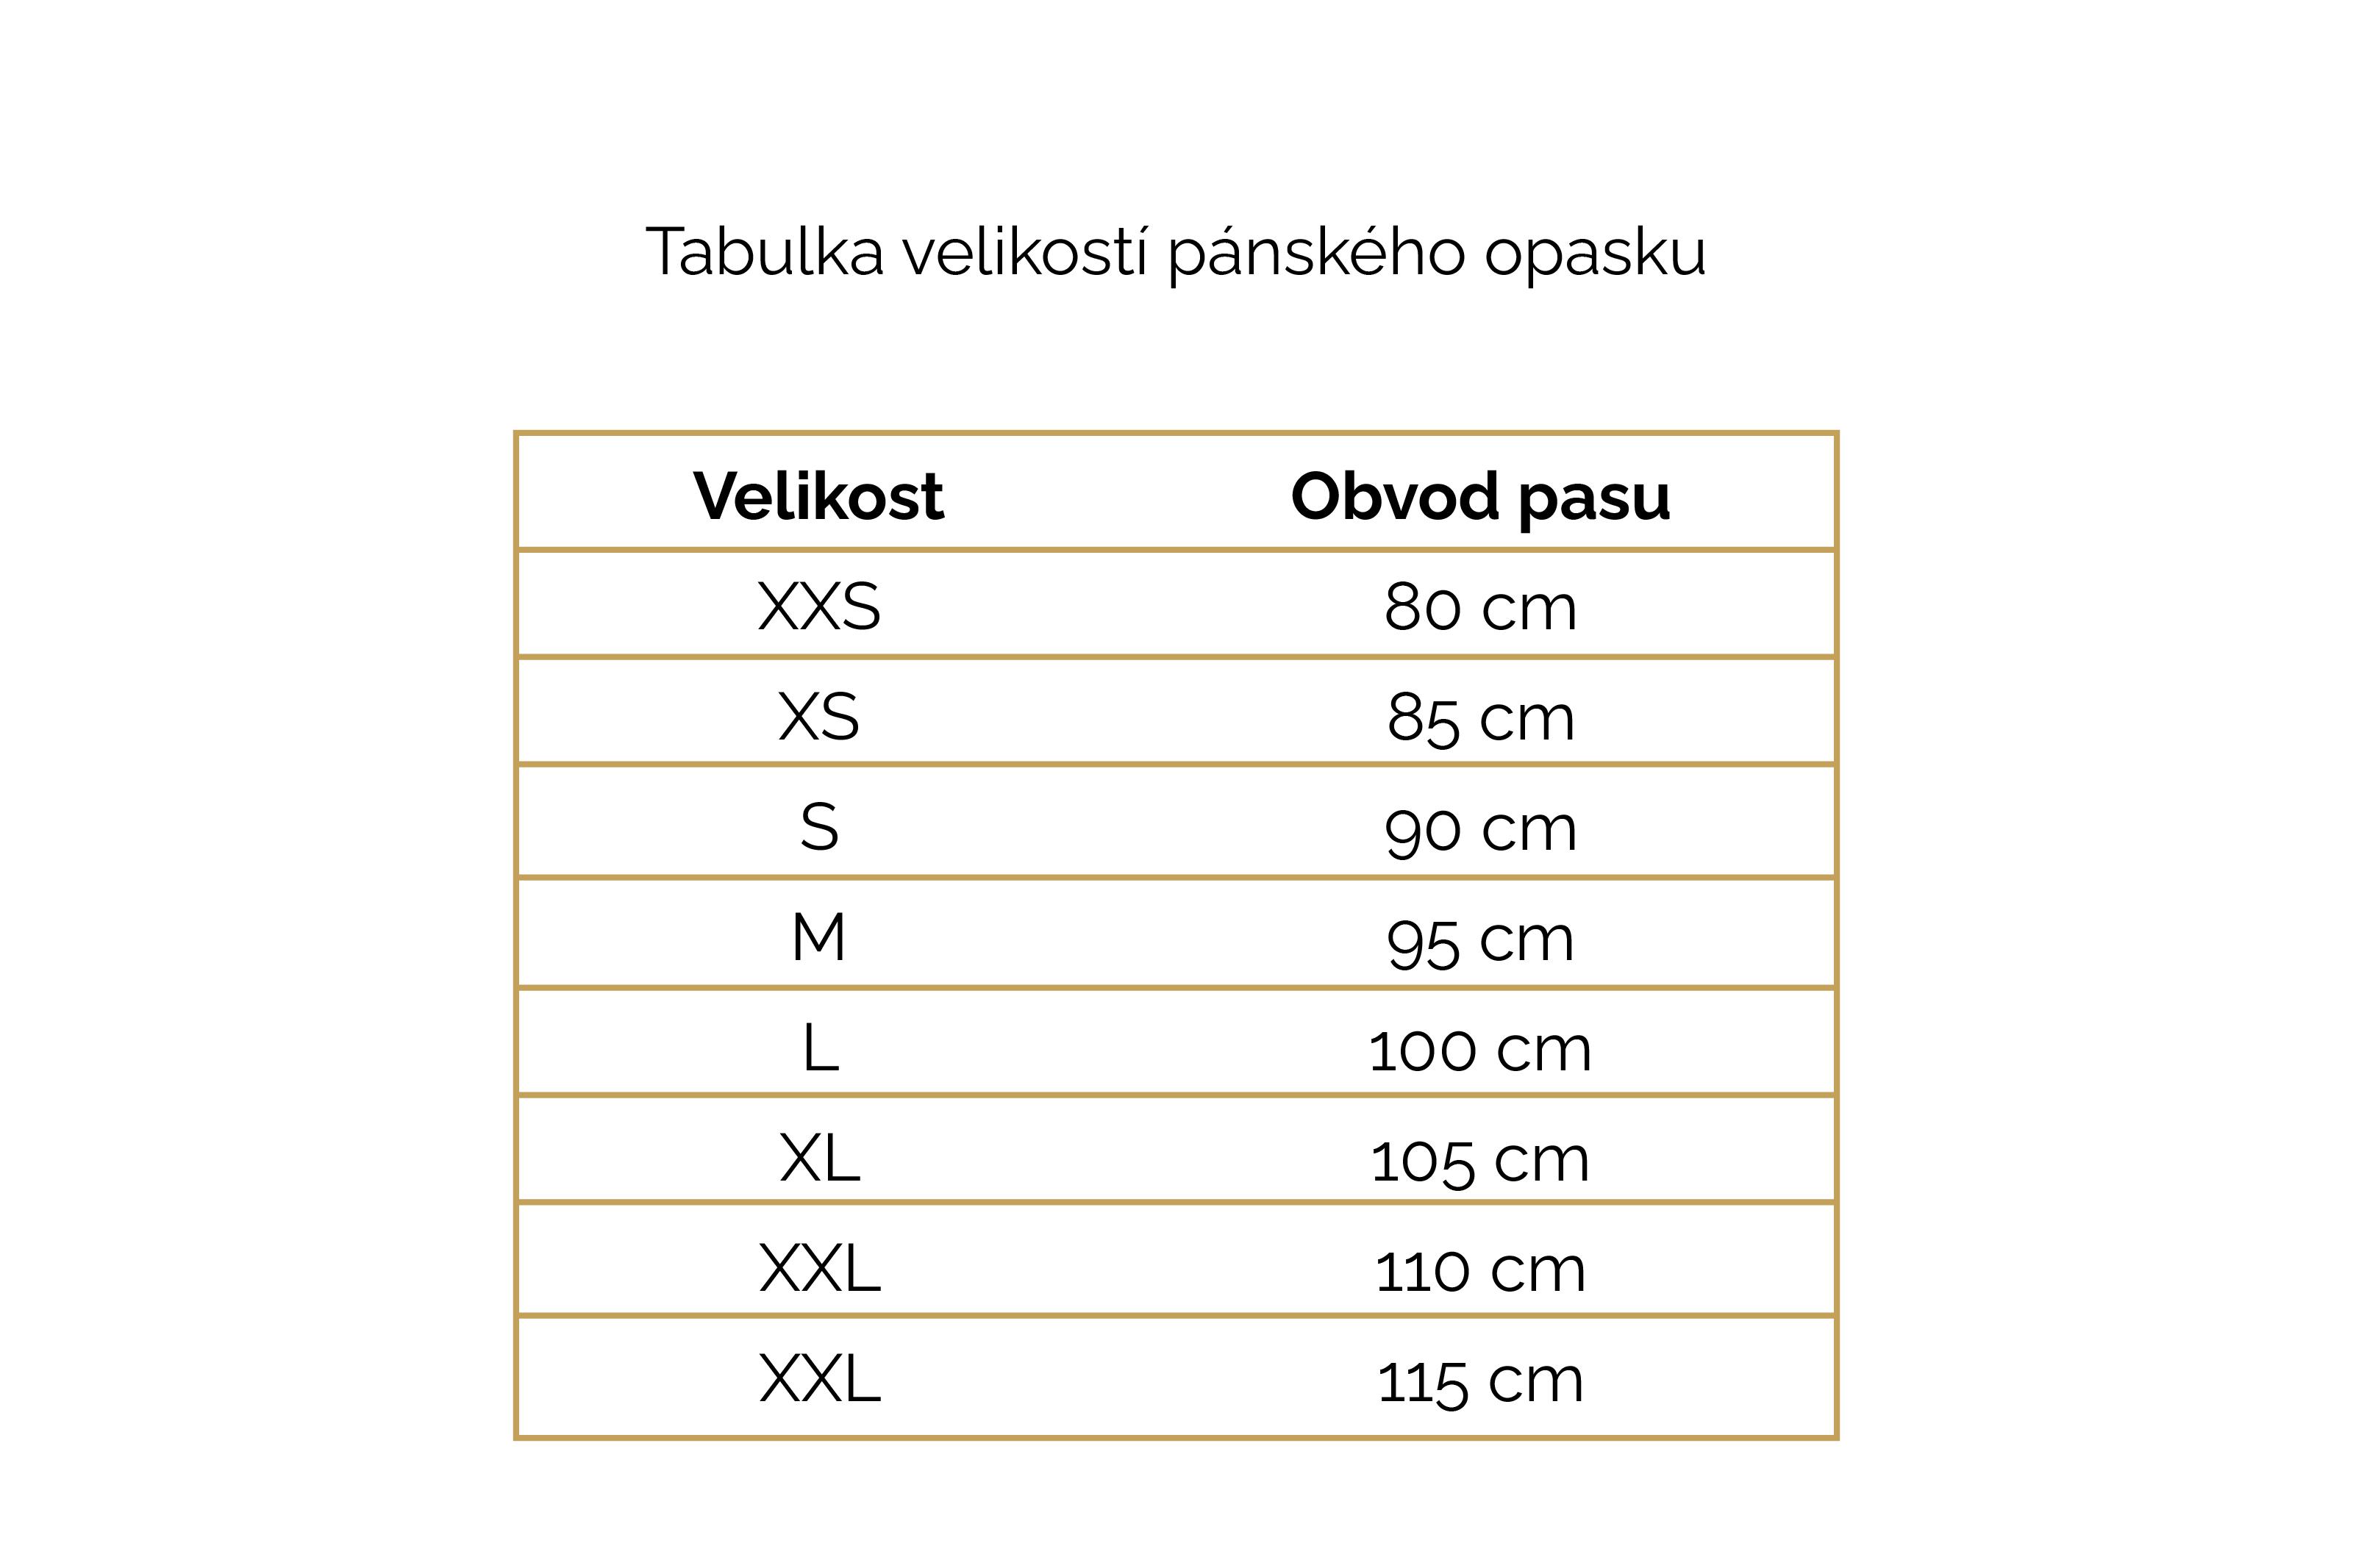 JAATY_jak-zvolitt-rozmer-opasku-tabulka-velikosti